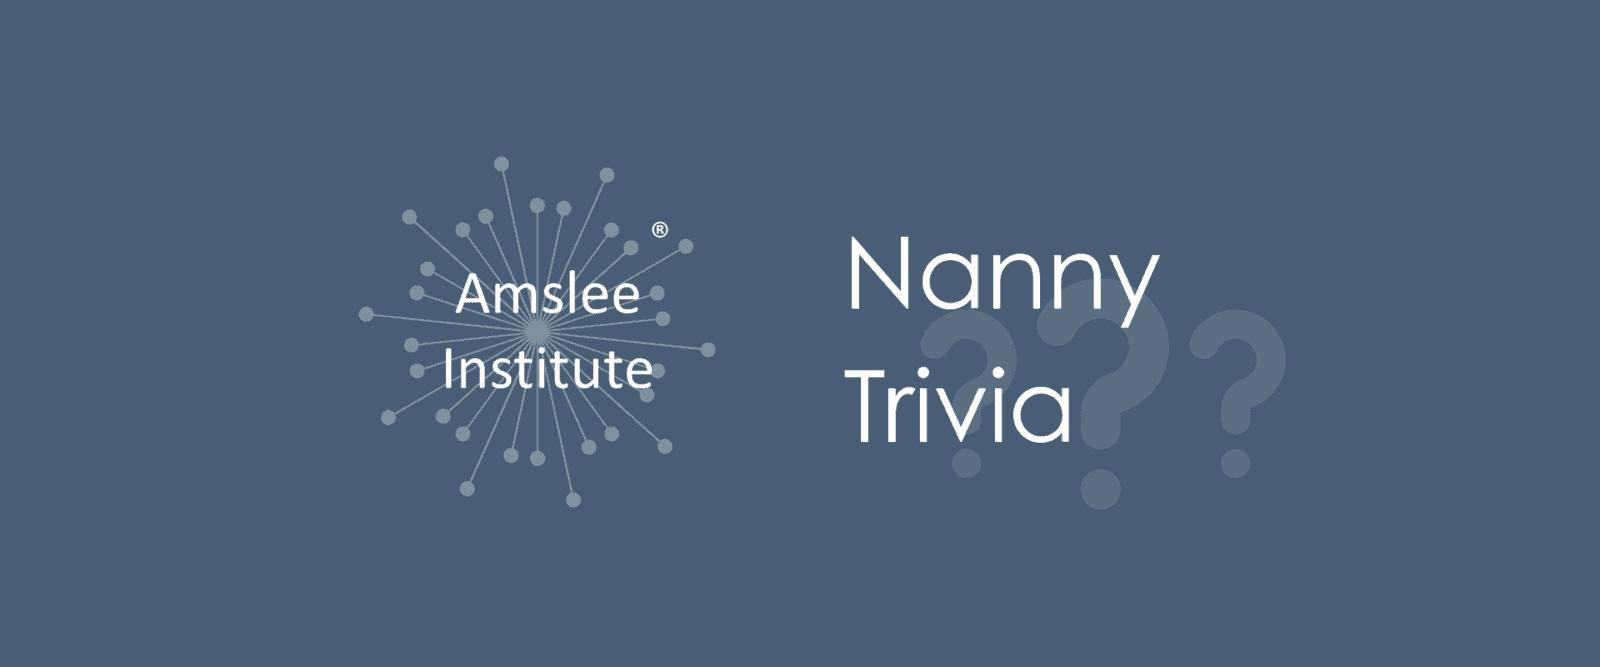 Nanny Trivia